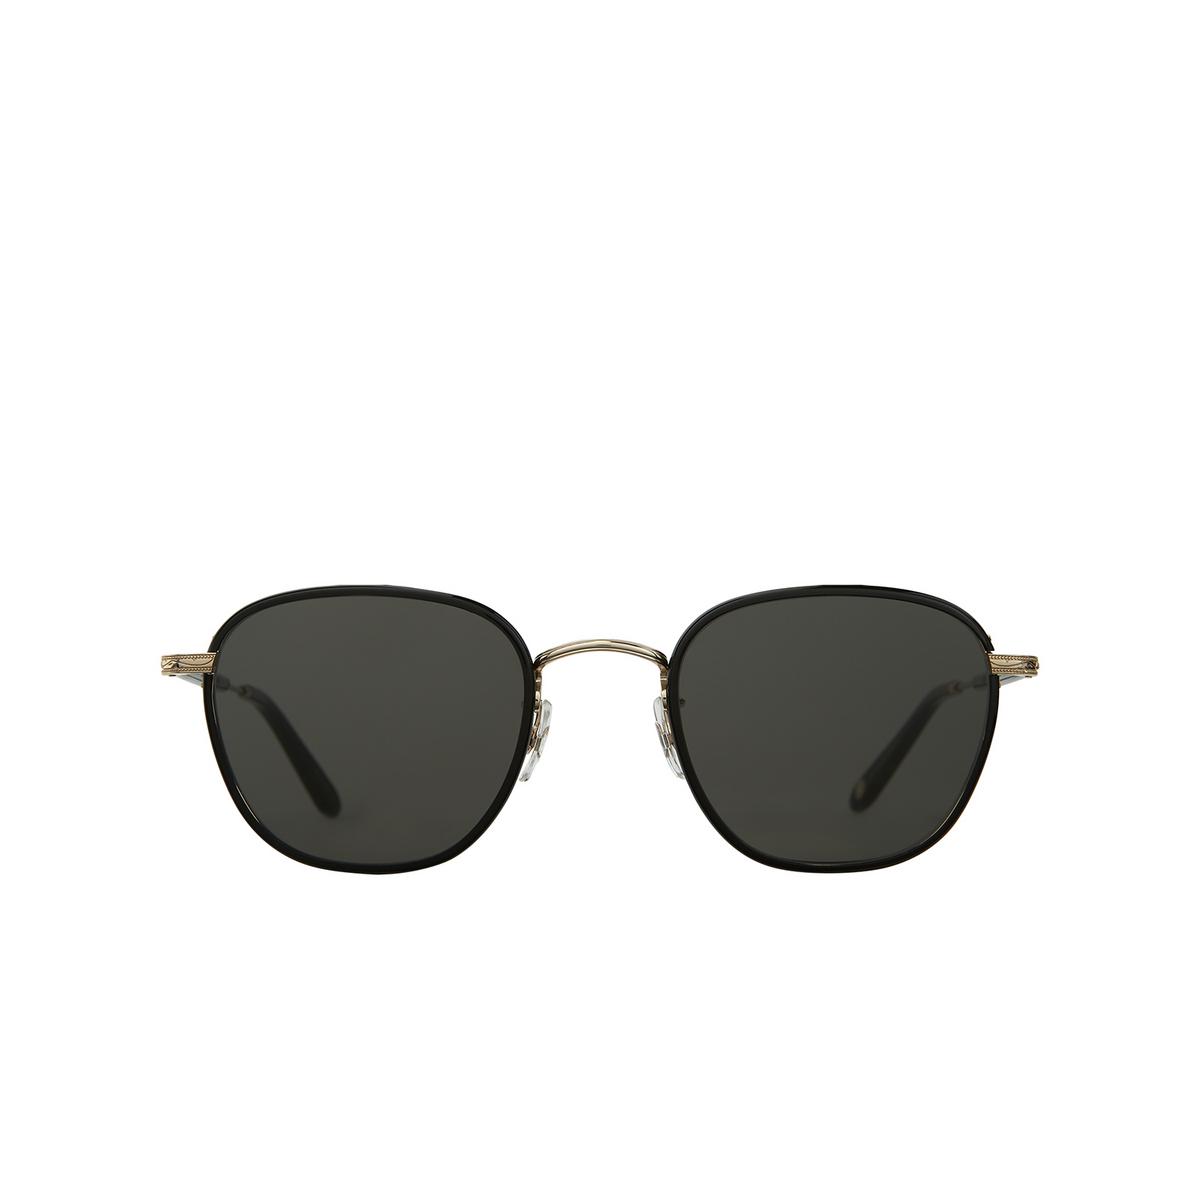 Garrett Leight® Square Sunglasses: Grant Sun color Black - Black Bk-g-bk/sfpgy - 1/2.